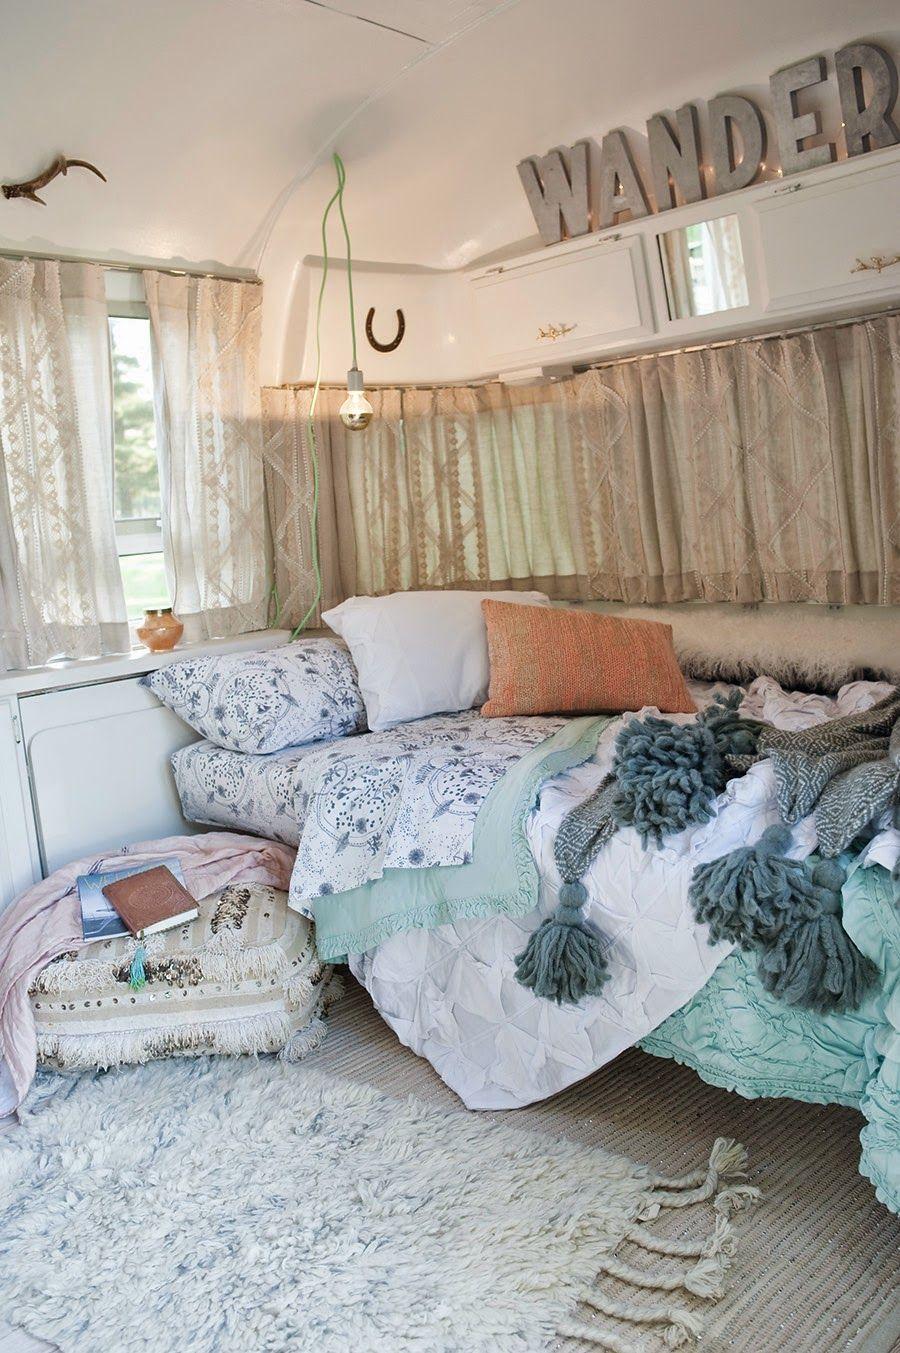 Acheter Une Roulotte Pour Y Vivre airstream dream. | bedroom inspirations, bedroom decor, home